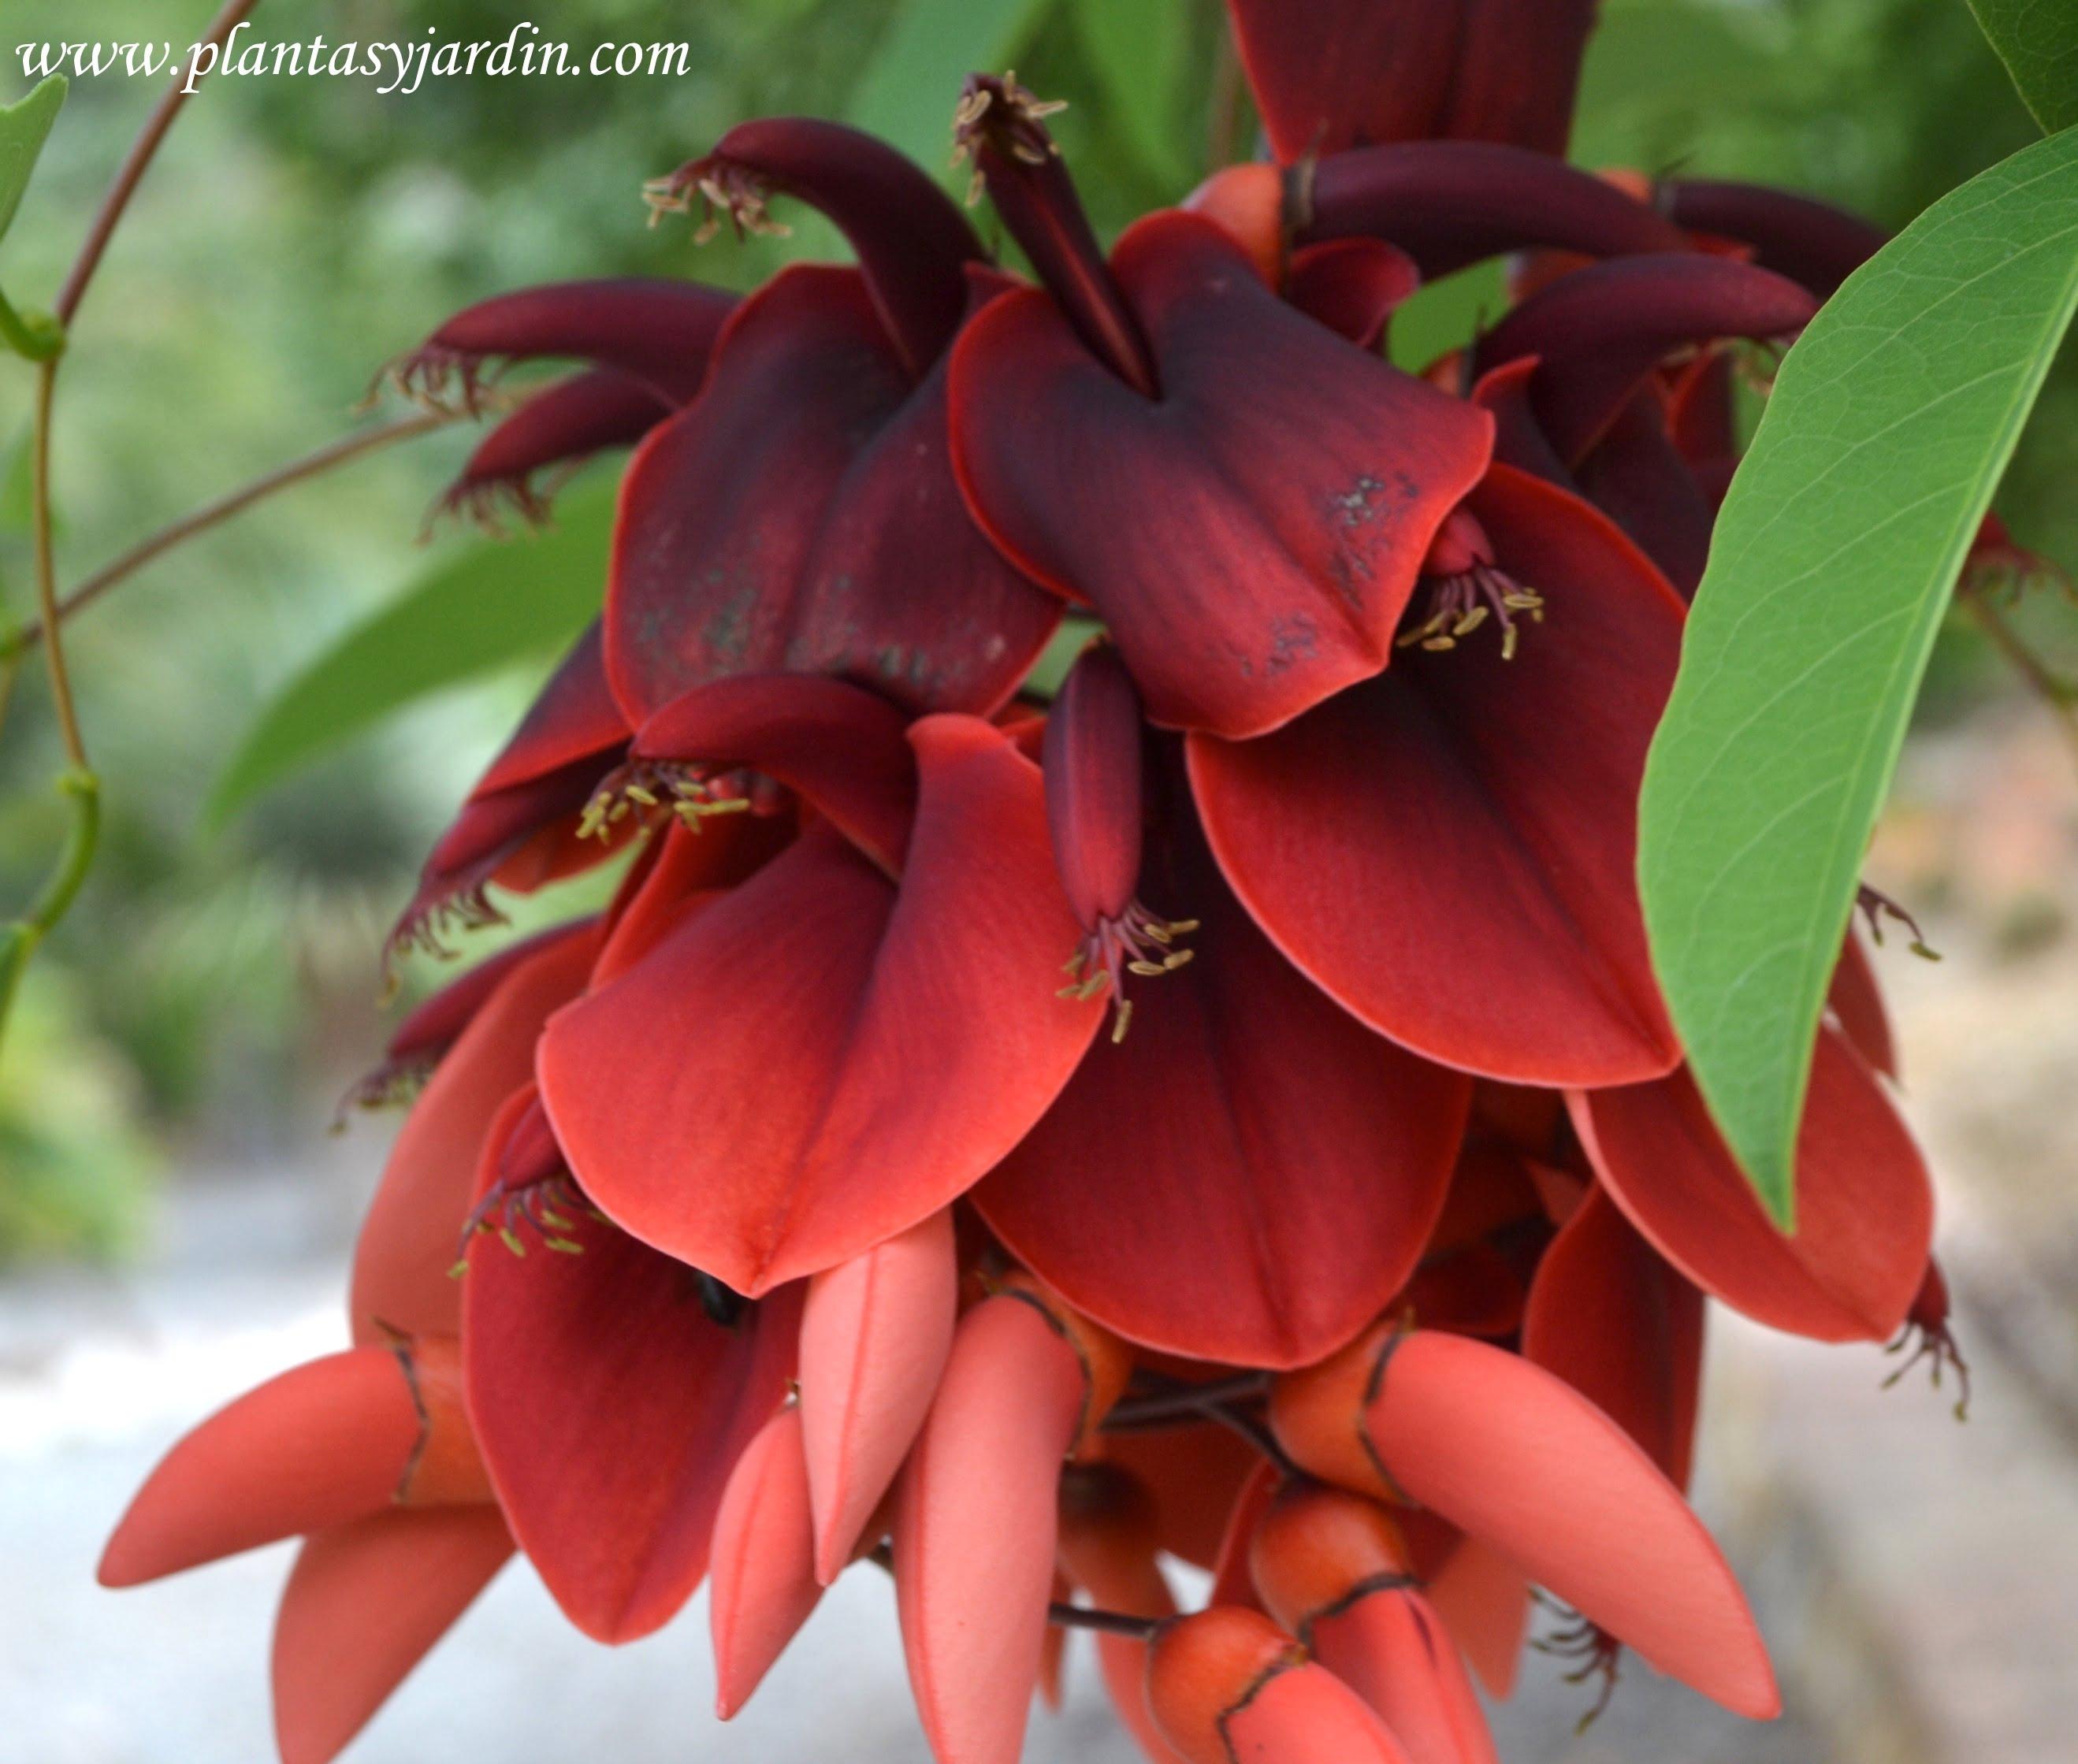 Erythrina crista galli, árbol y flor nacional de Argentina